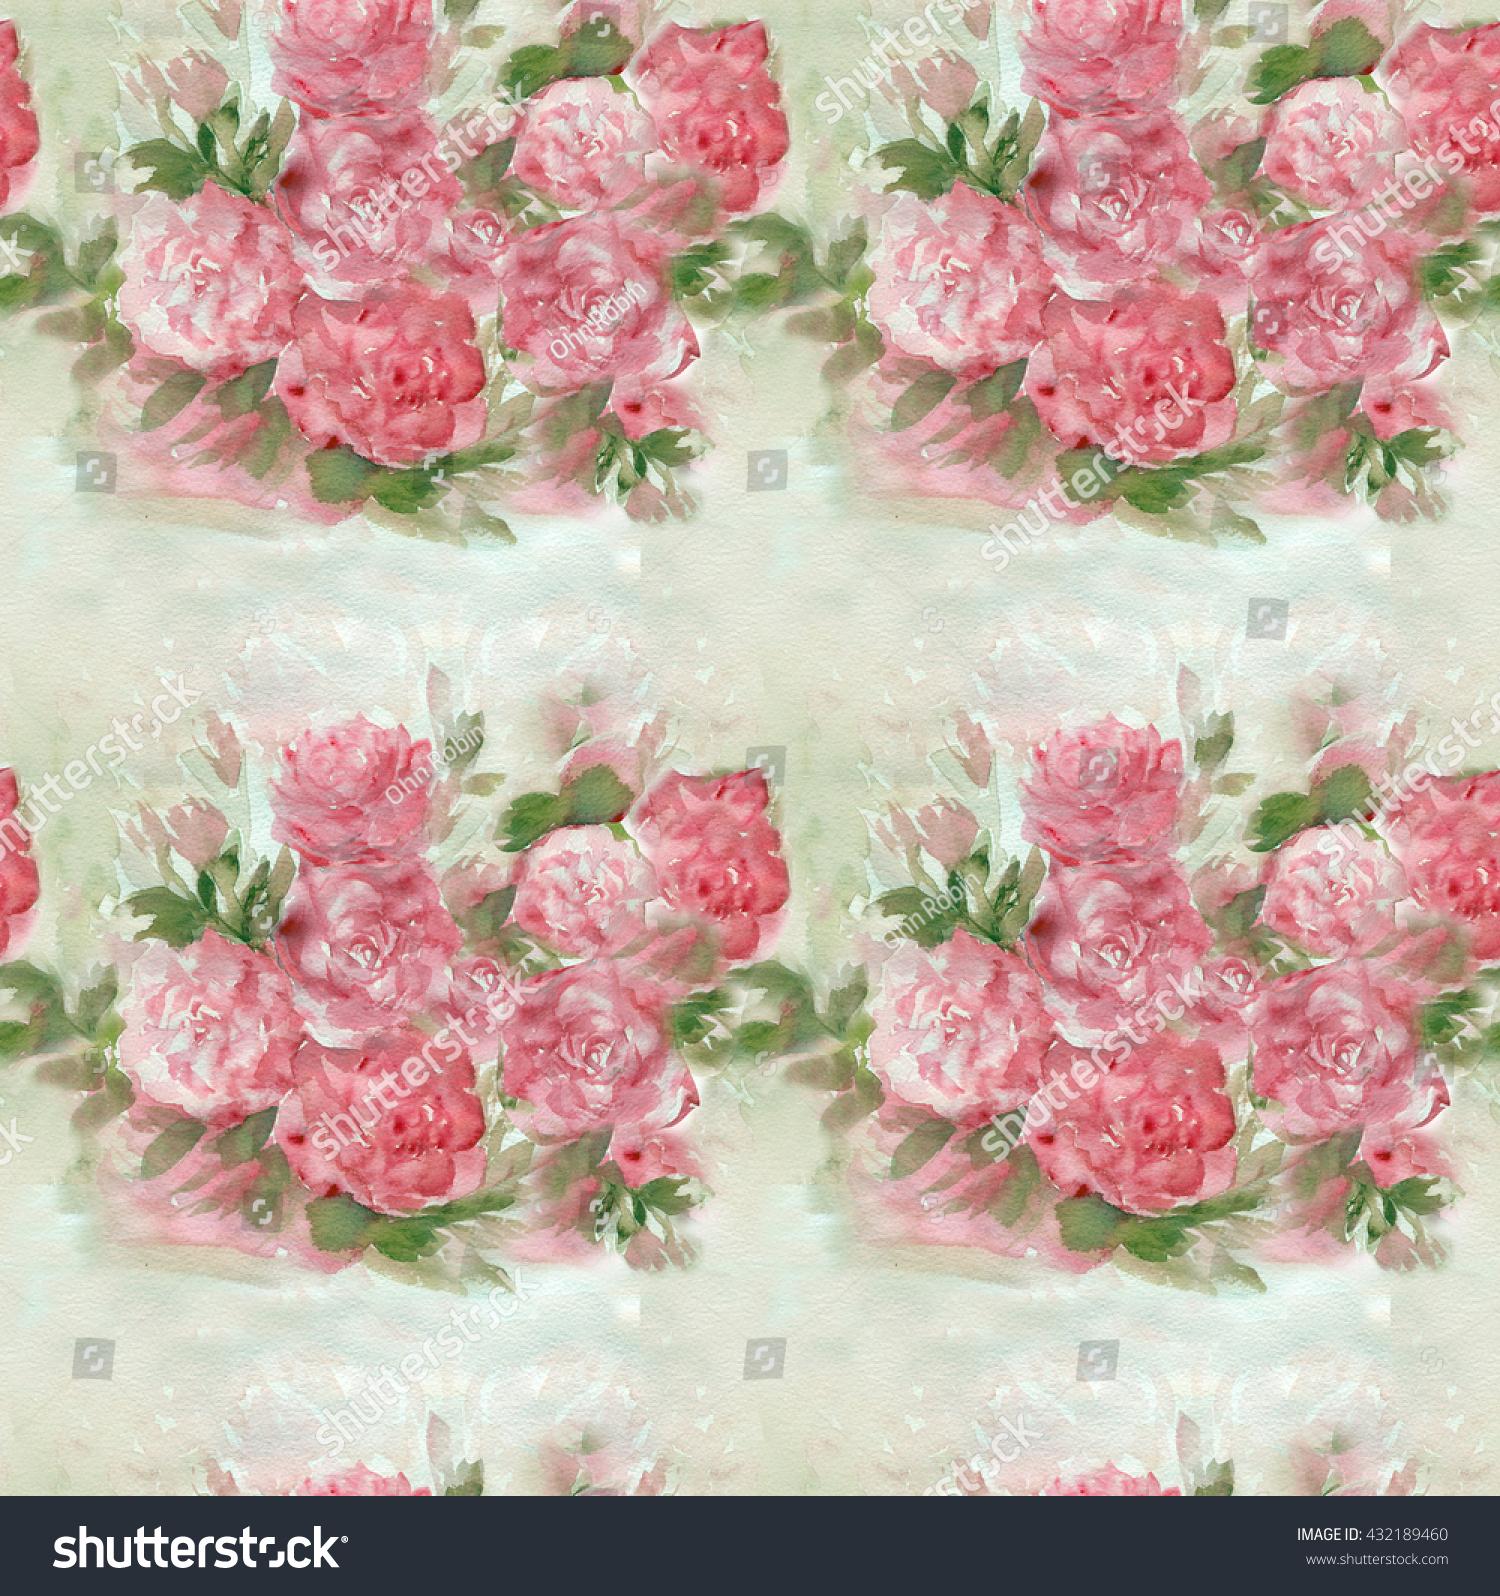 Beautiful pink rose wallpaper seamless texture stock illustration beautiful pink rose wallpaper seamless texture izmirmasajfo